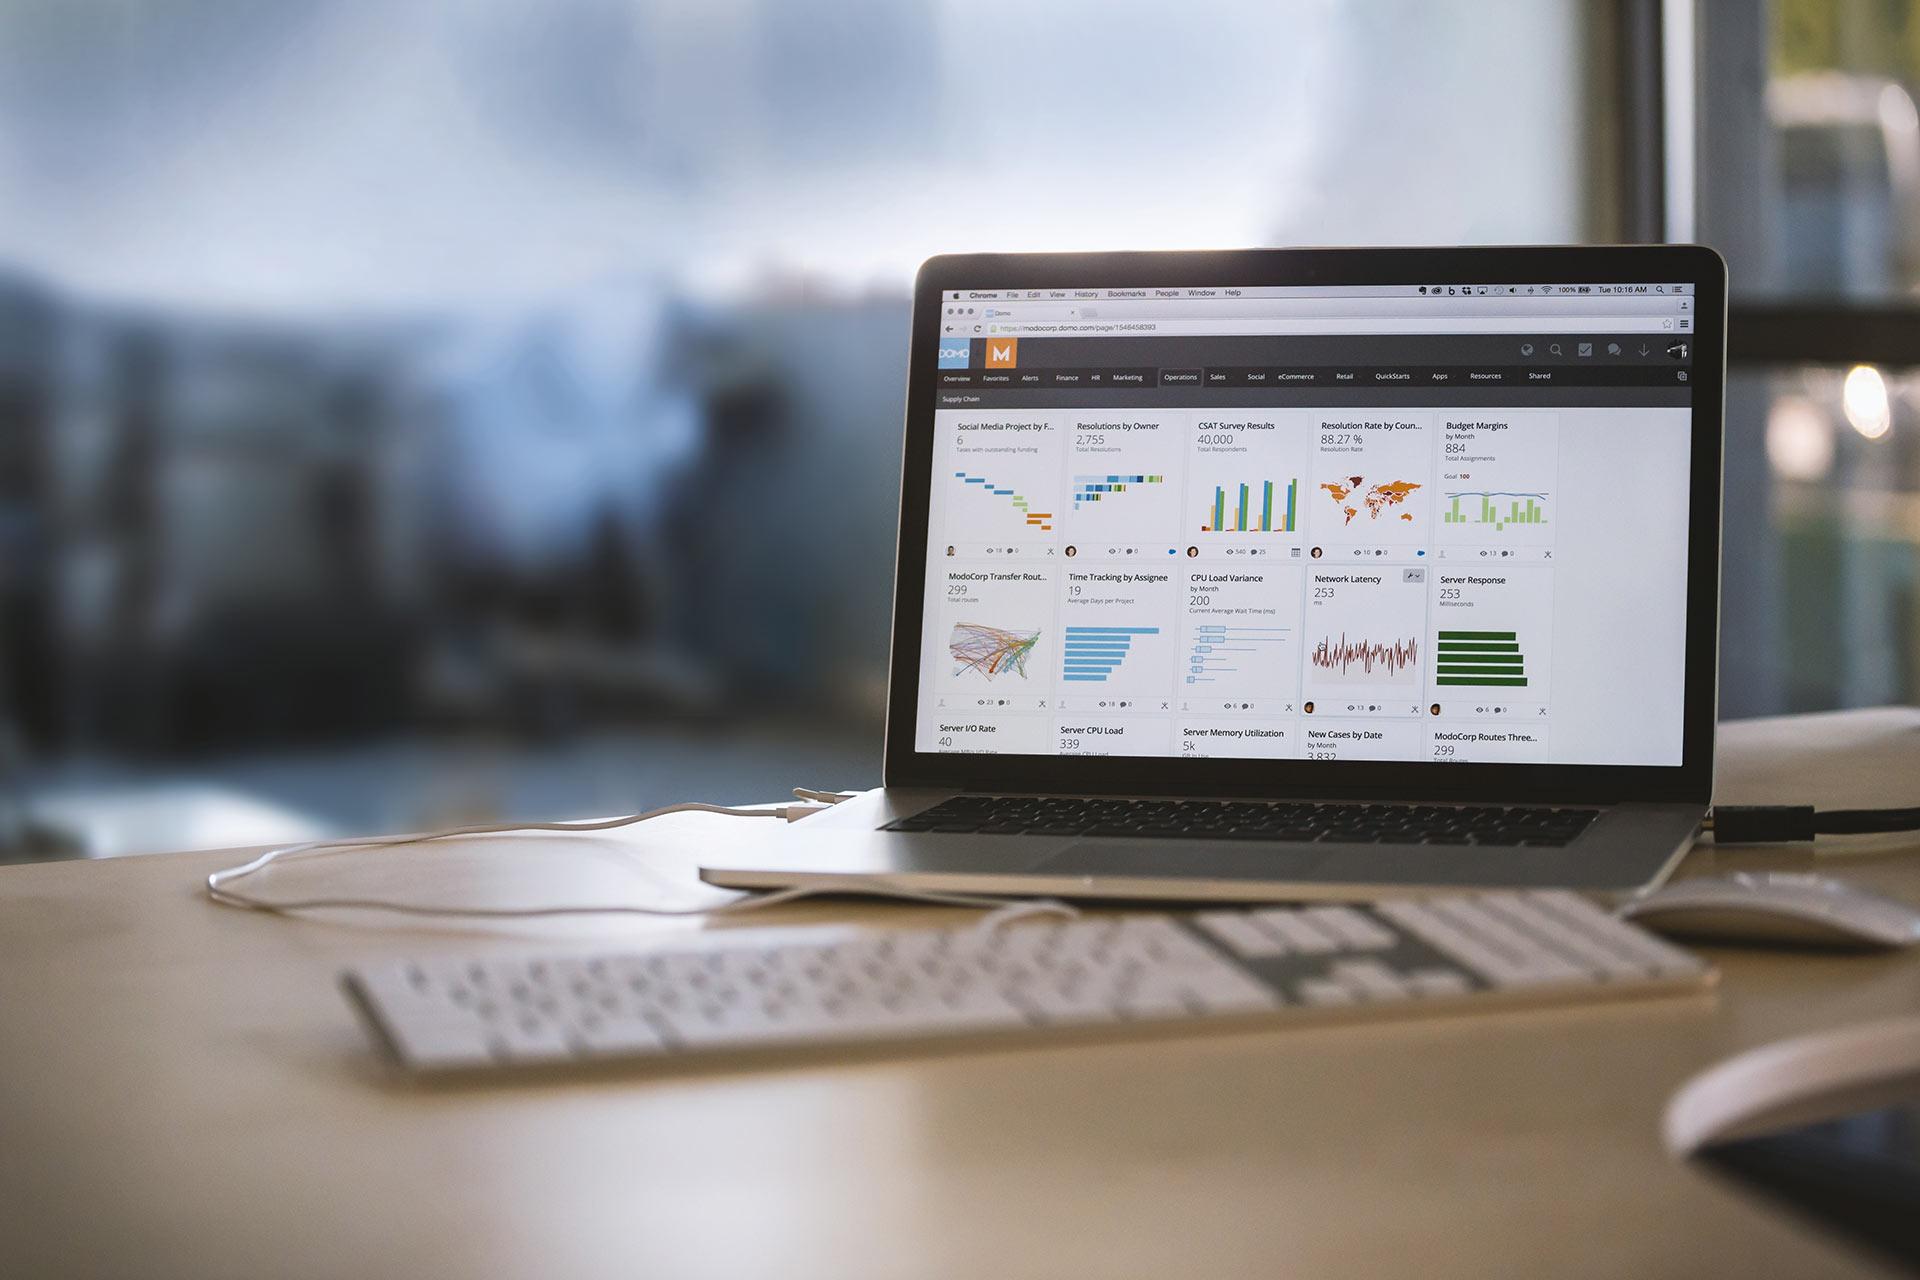 onefourzero full digital diligence image depicting digital analytics software